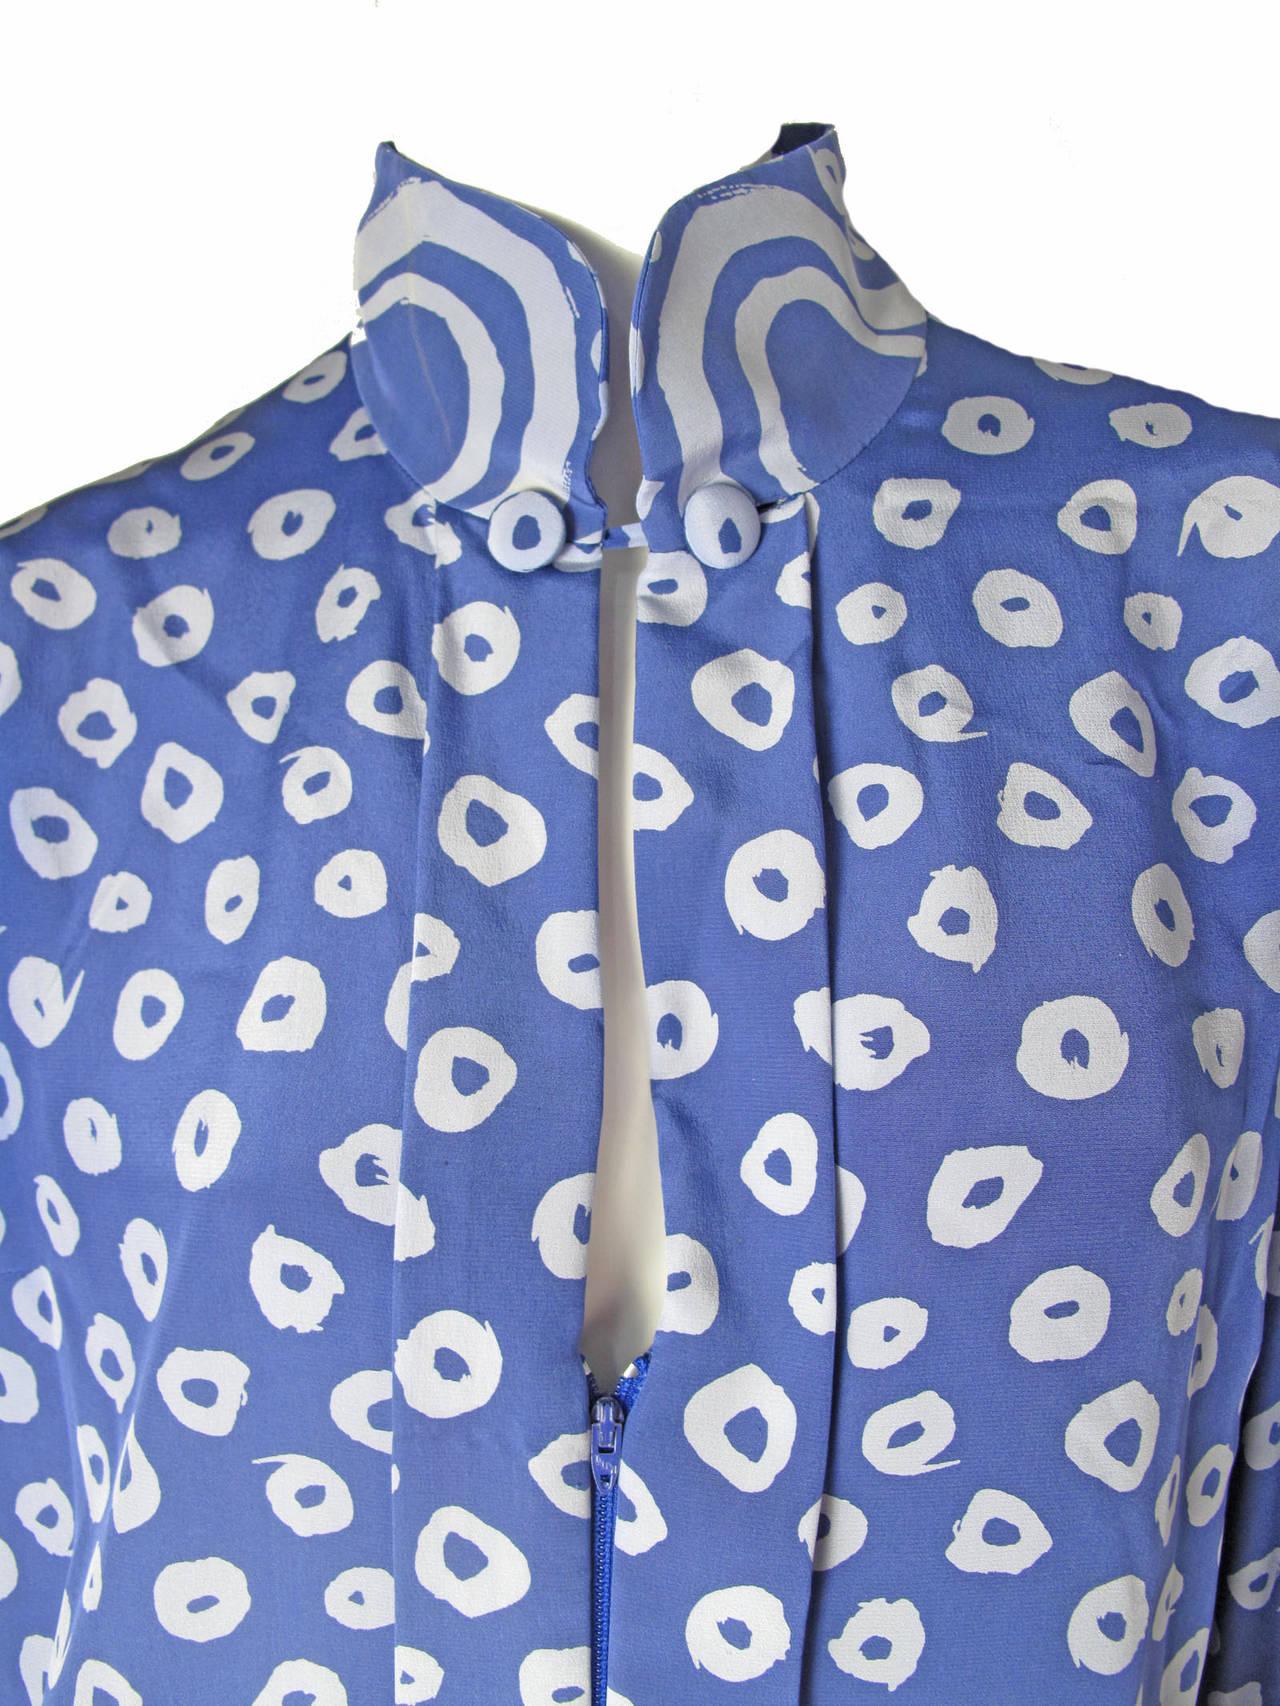 Pauline Trigere Blue Silk Dress -sale 4